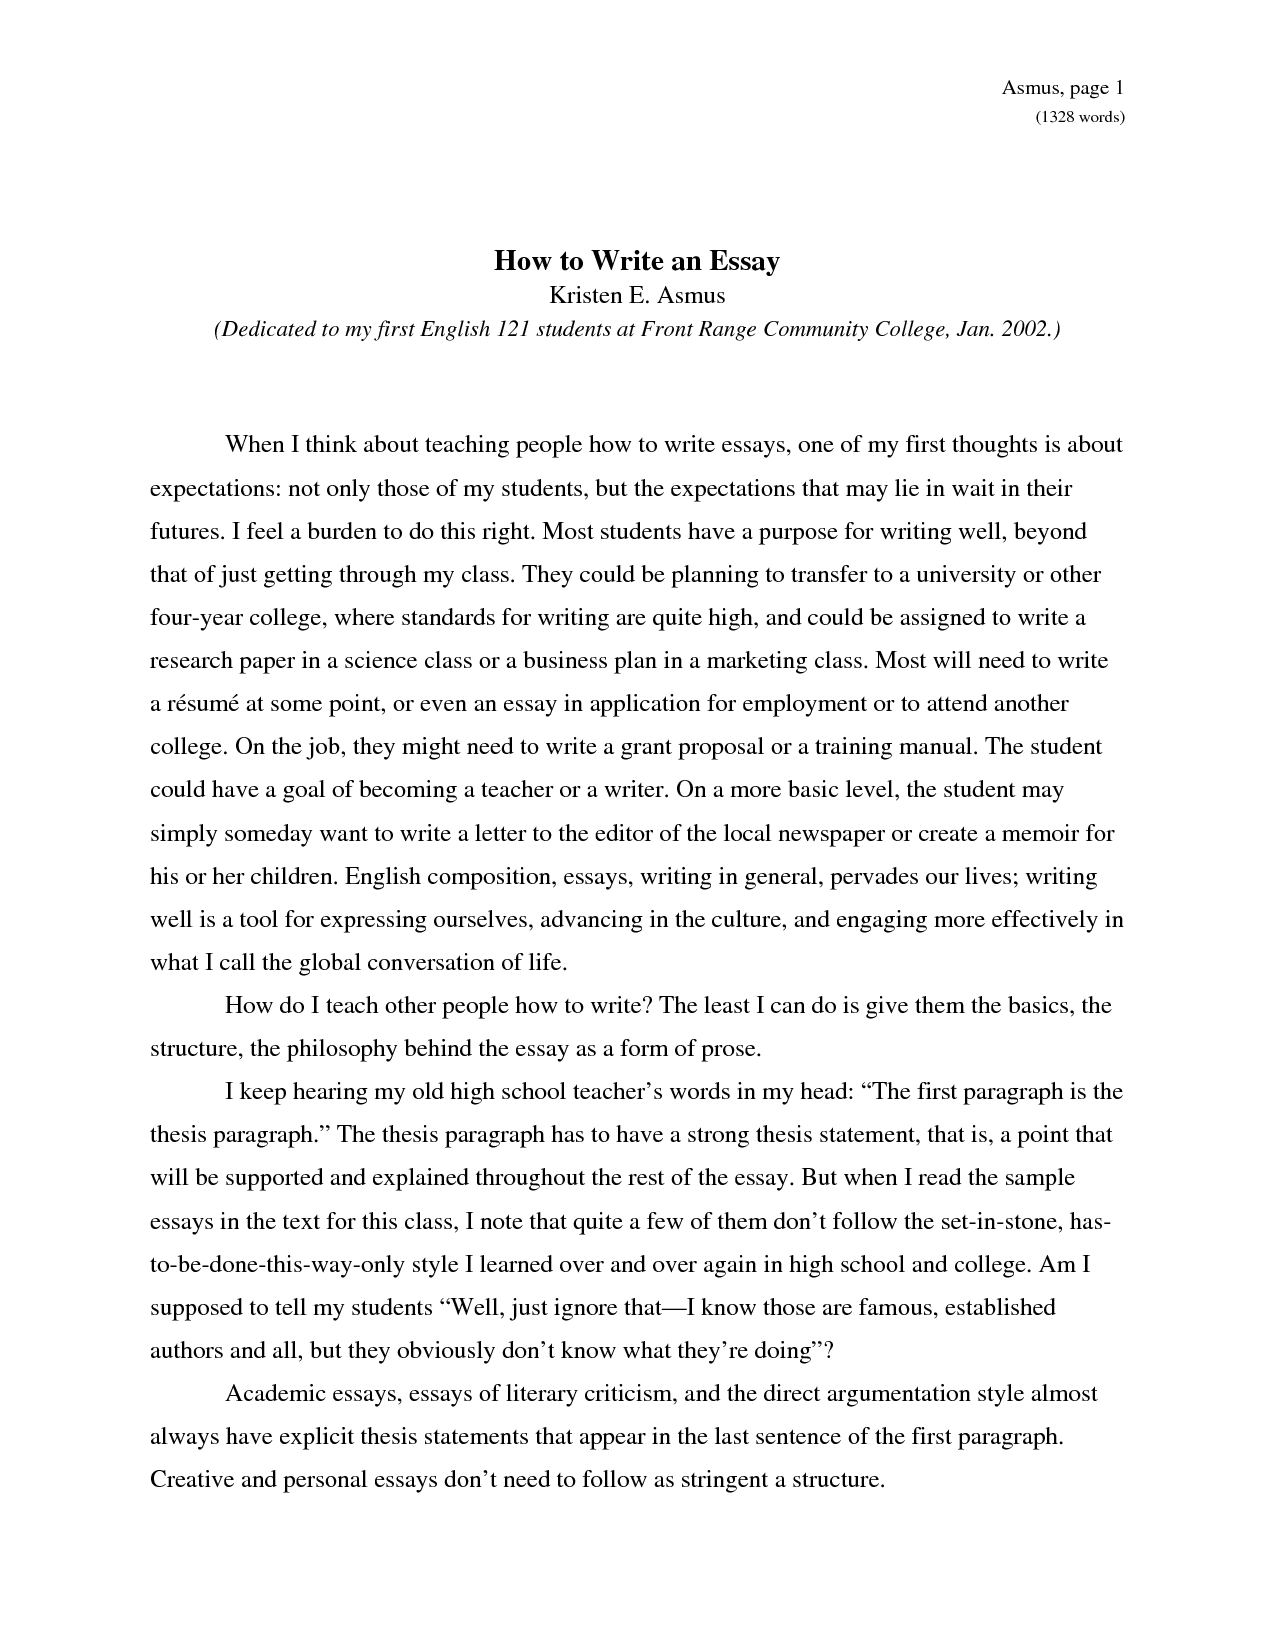 How to do a good dissertation